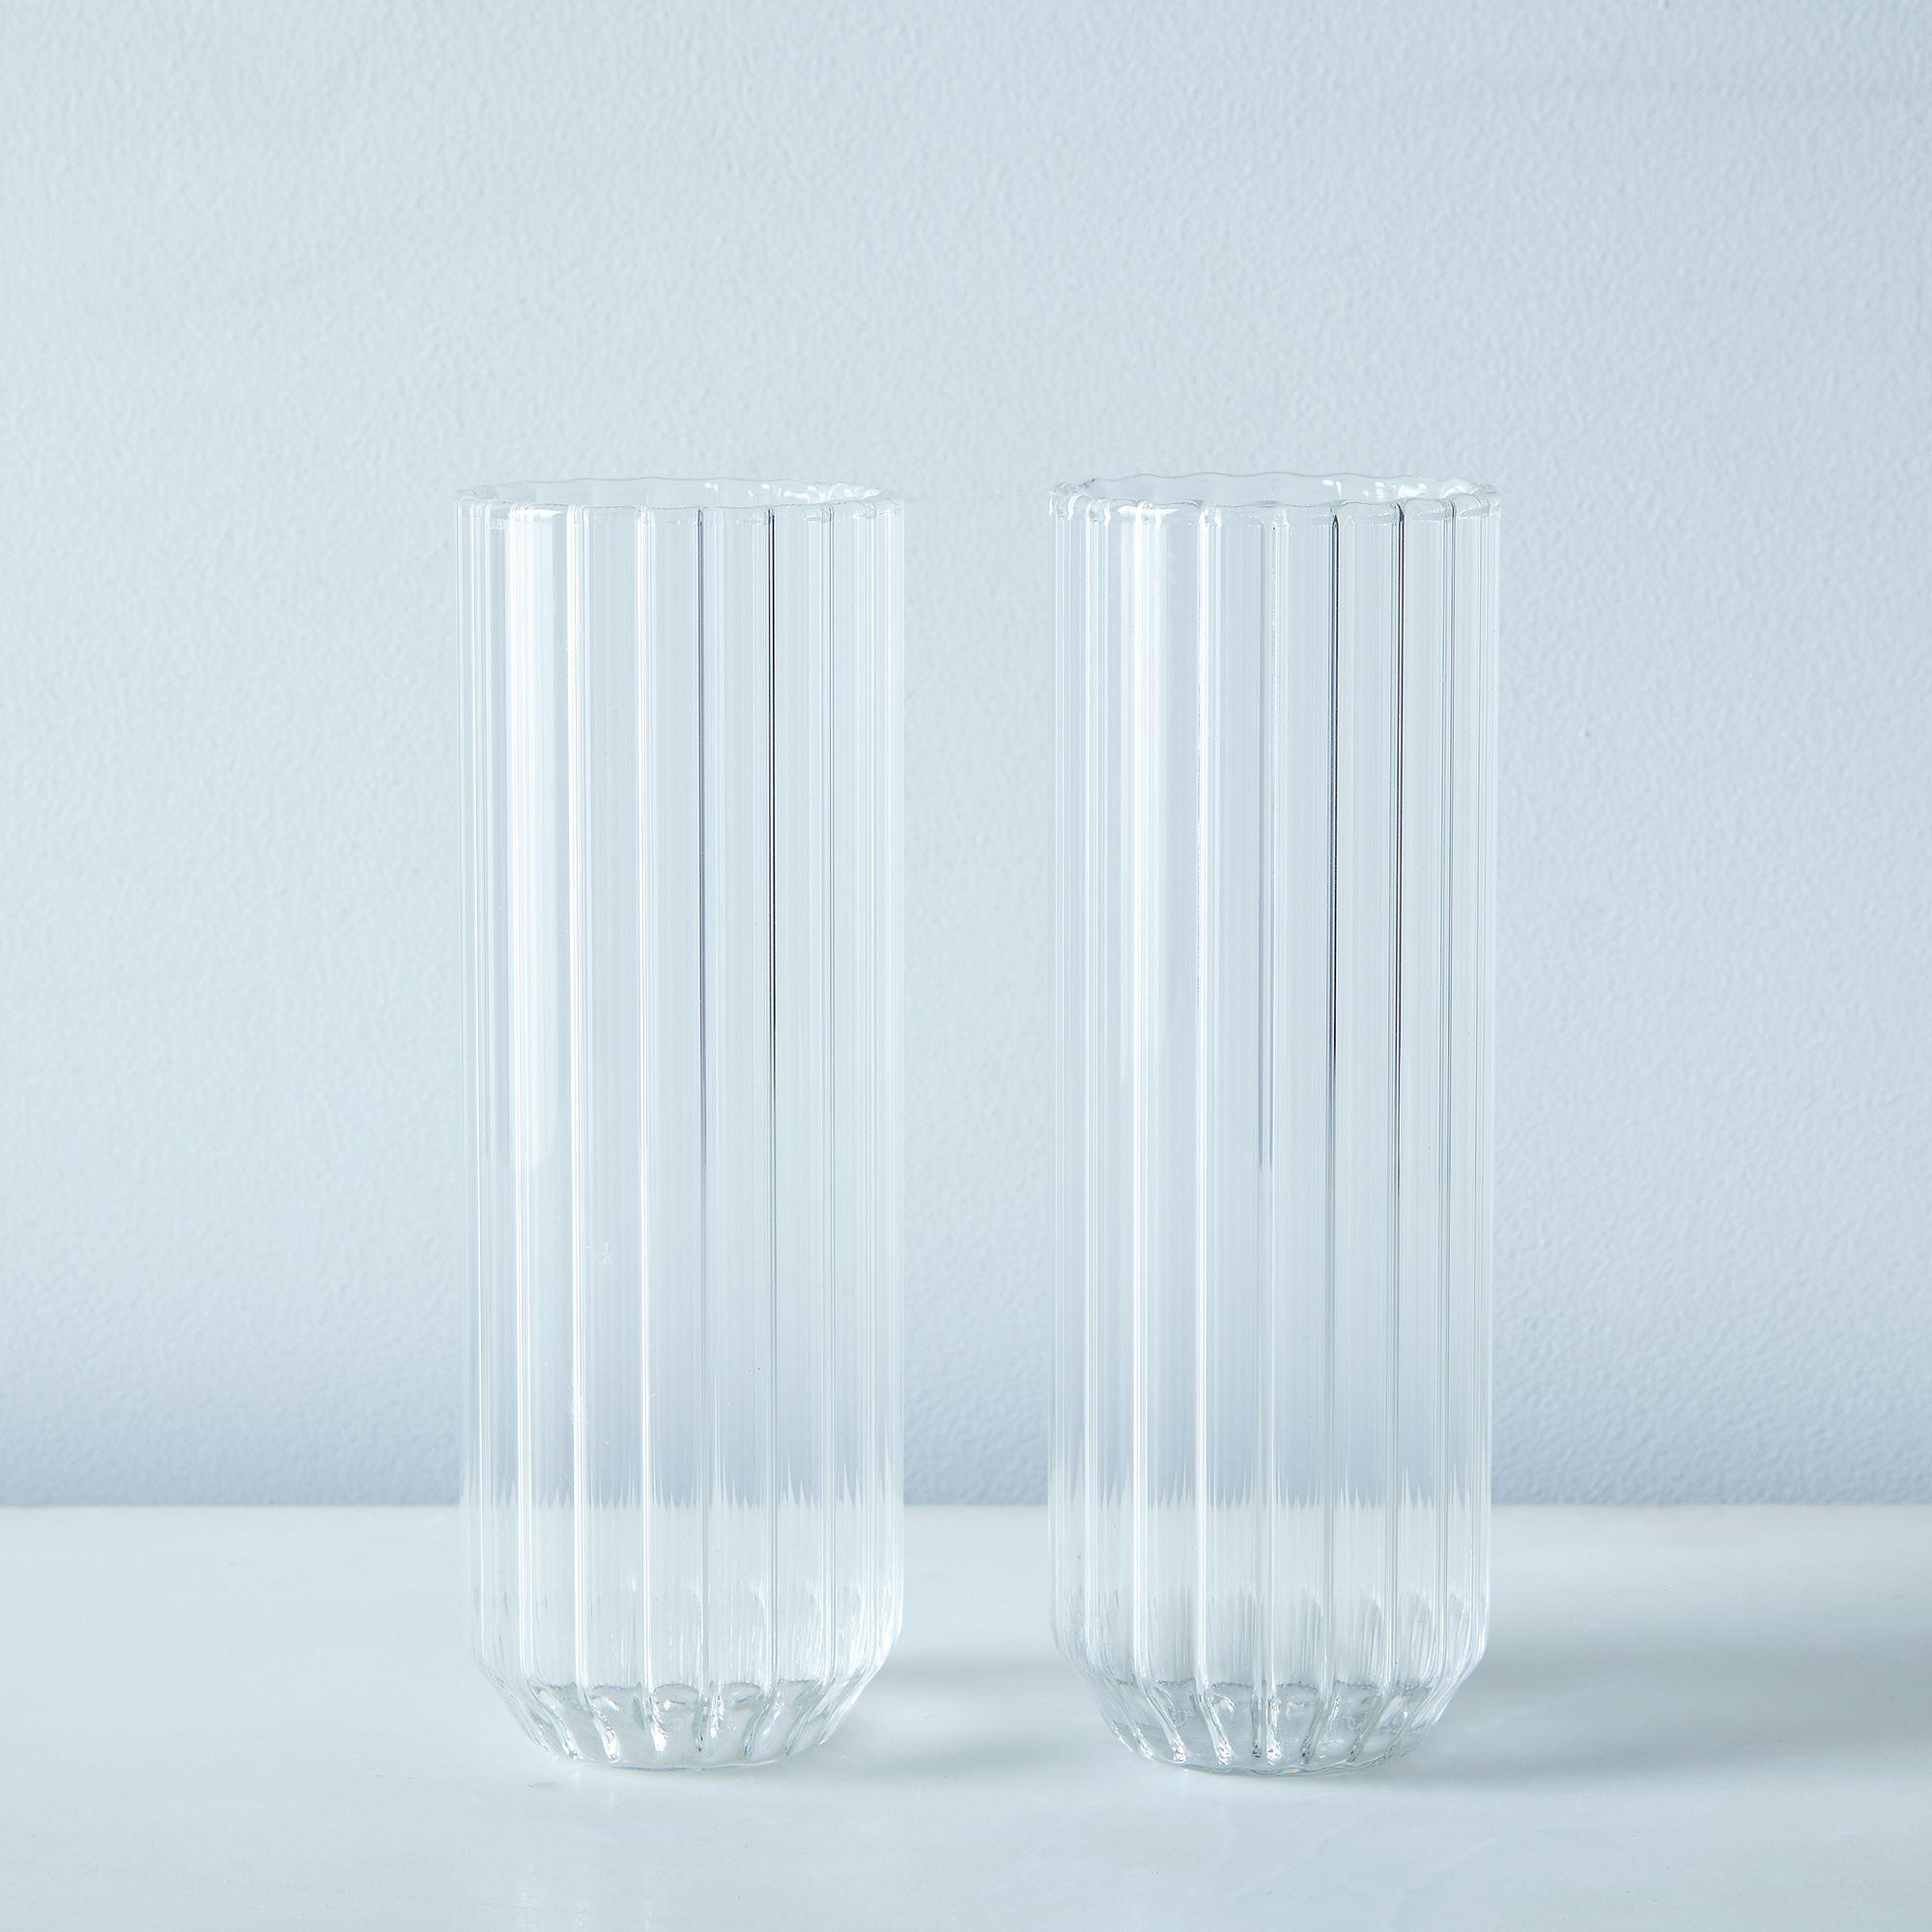 Glasses by epicurean